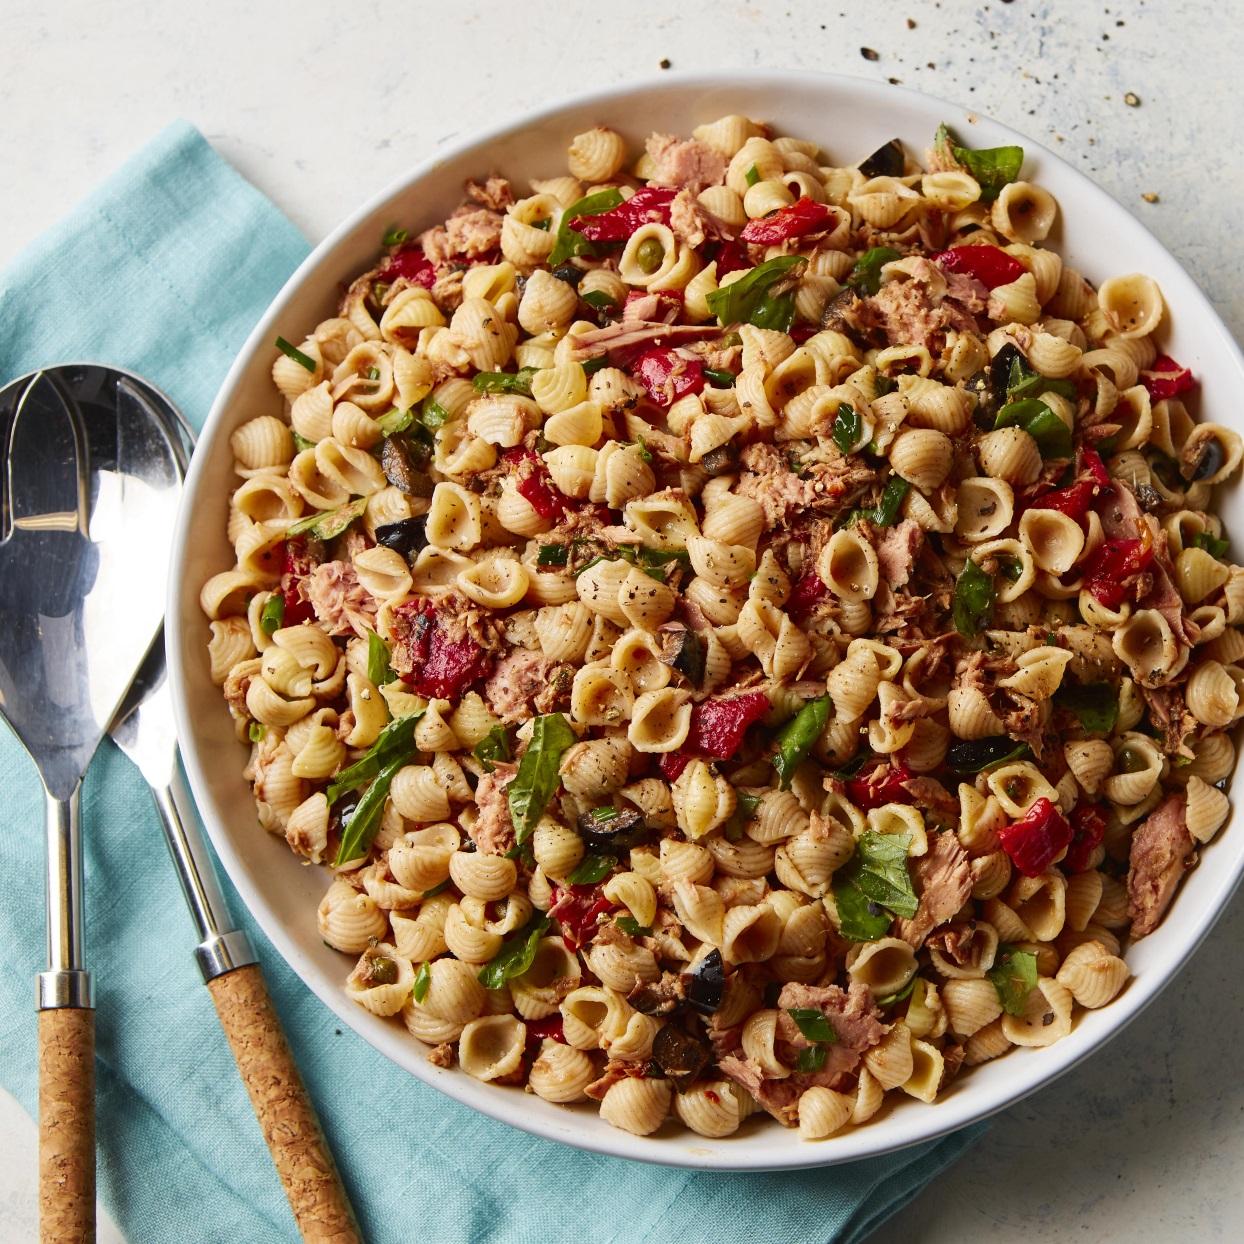 Pasta Salad Nicoise Allrecipes Trusted Brands